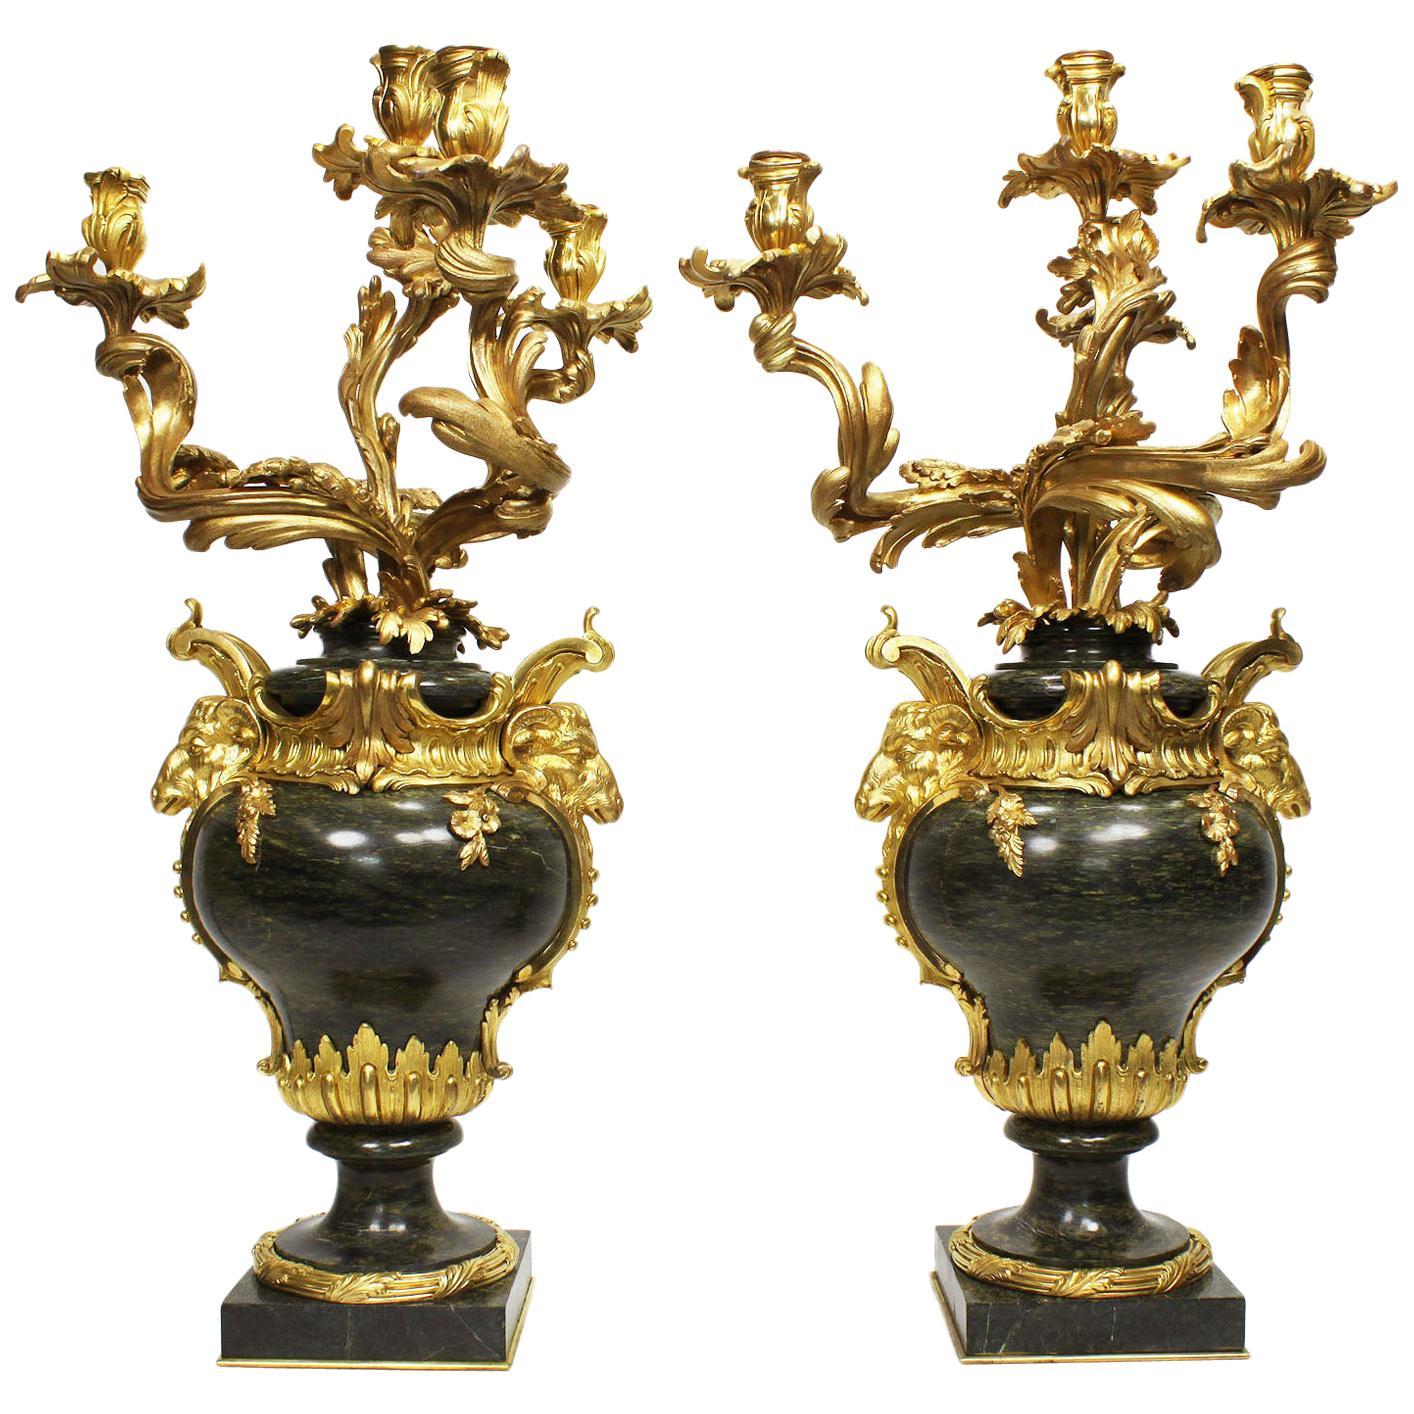 Pair of French 19th Century Louis XV Style Marble & Ormolu Candelabra Henri Vian